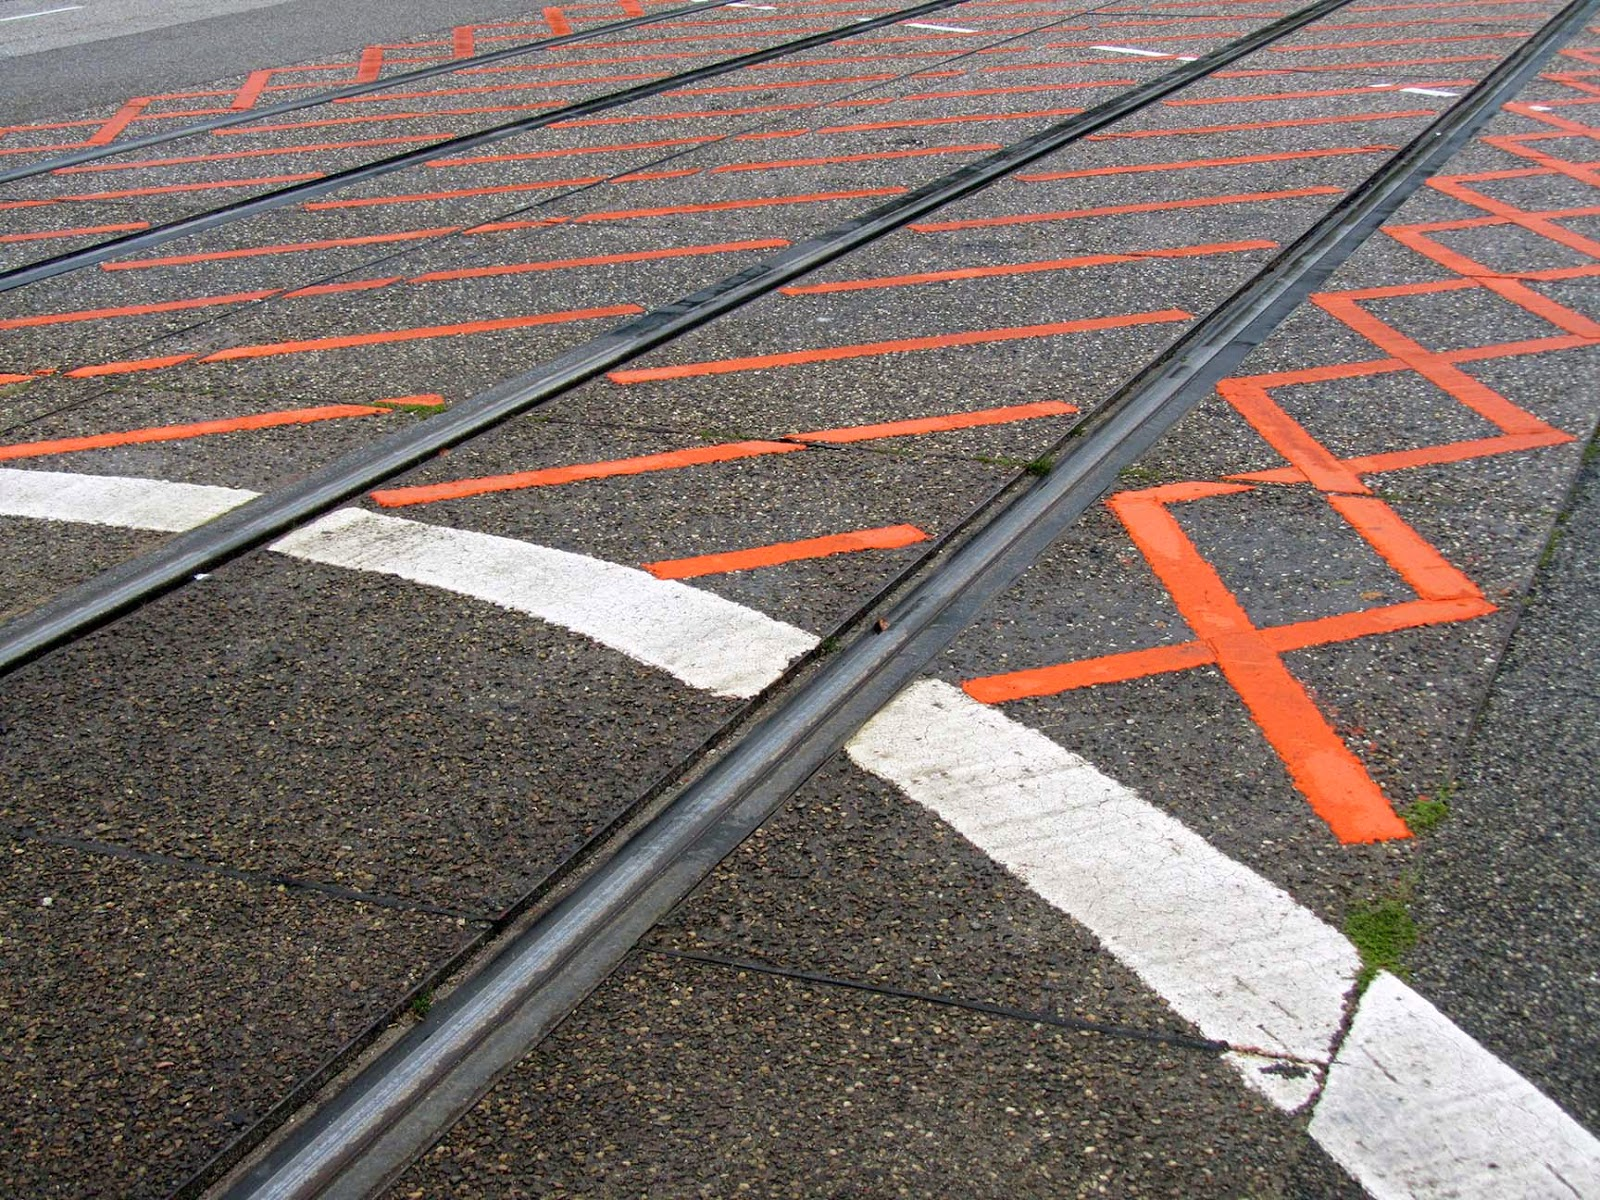 street: orange grid